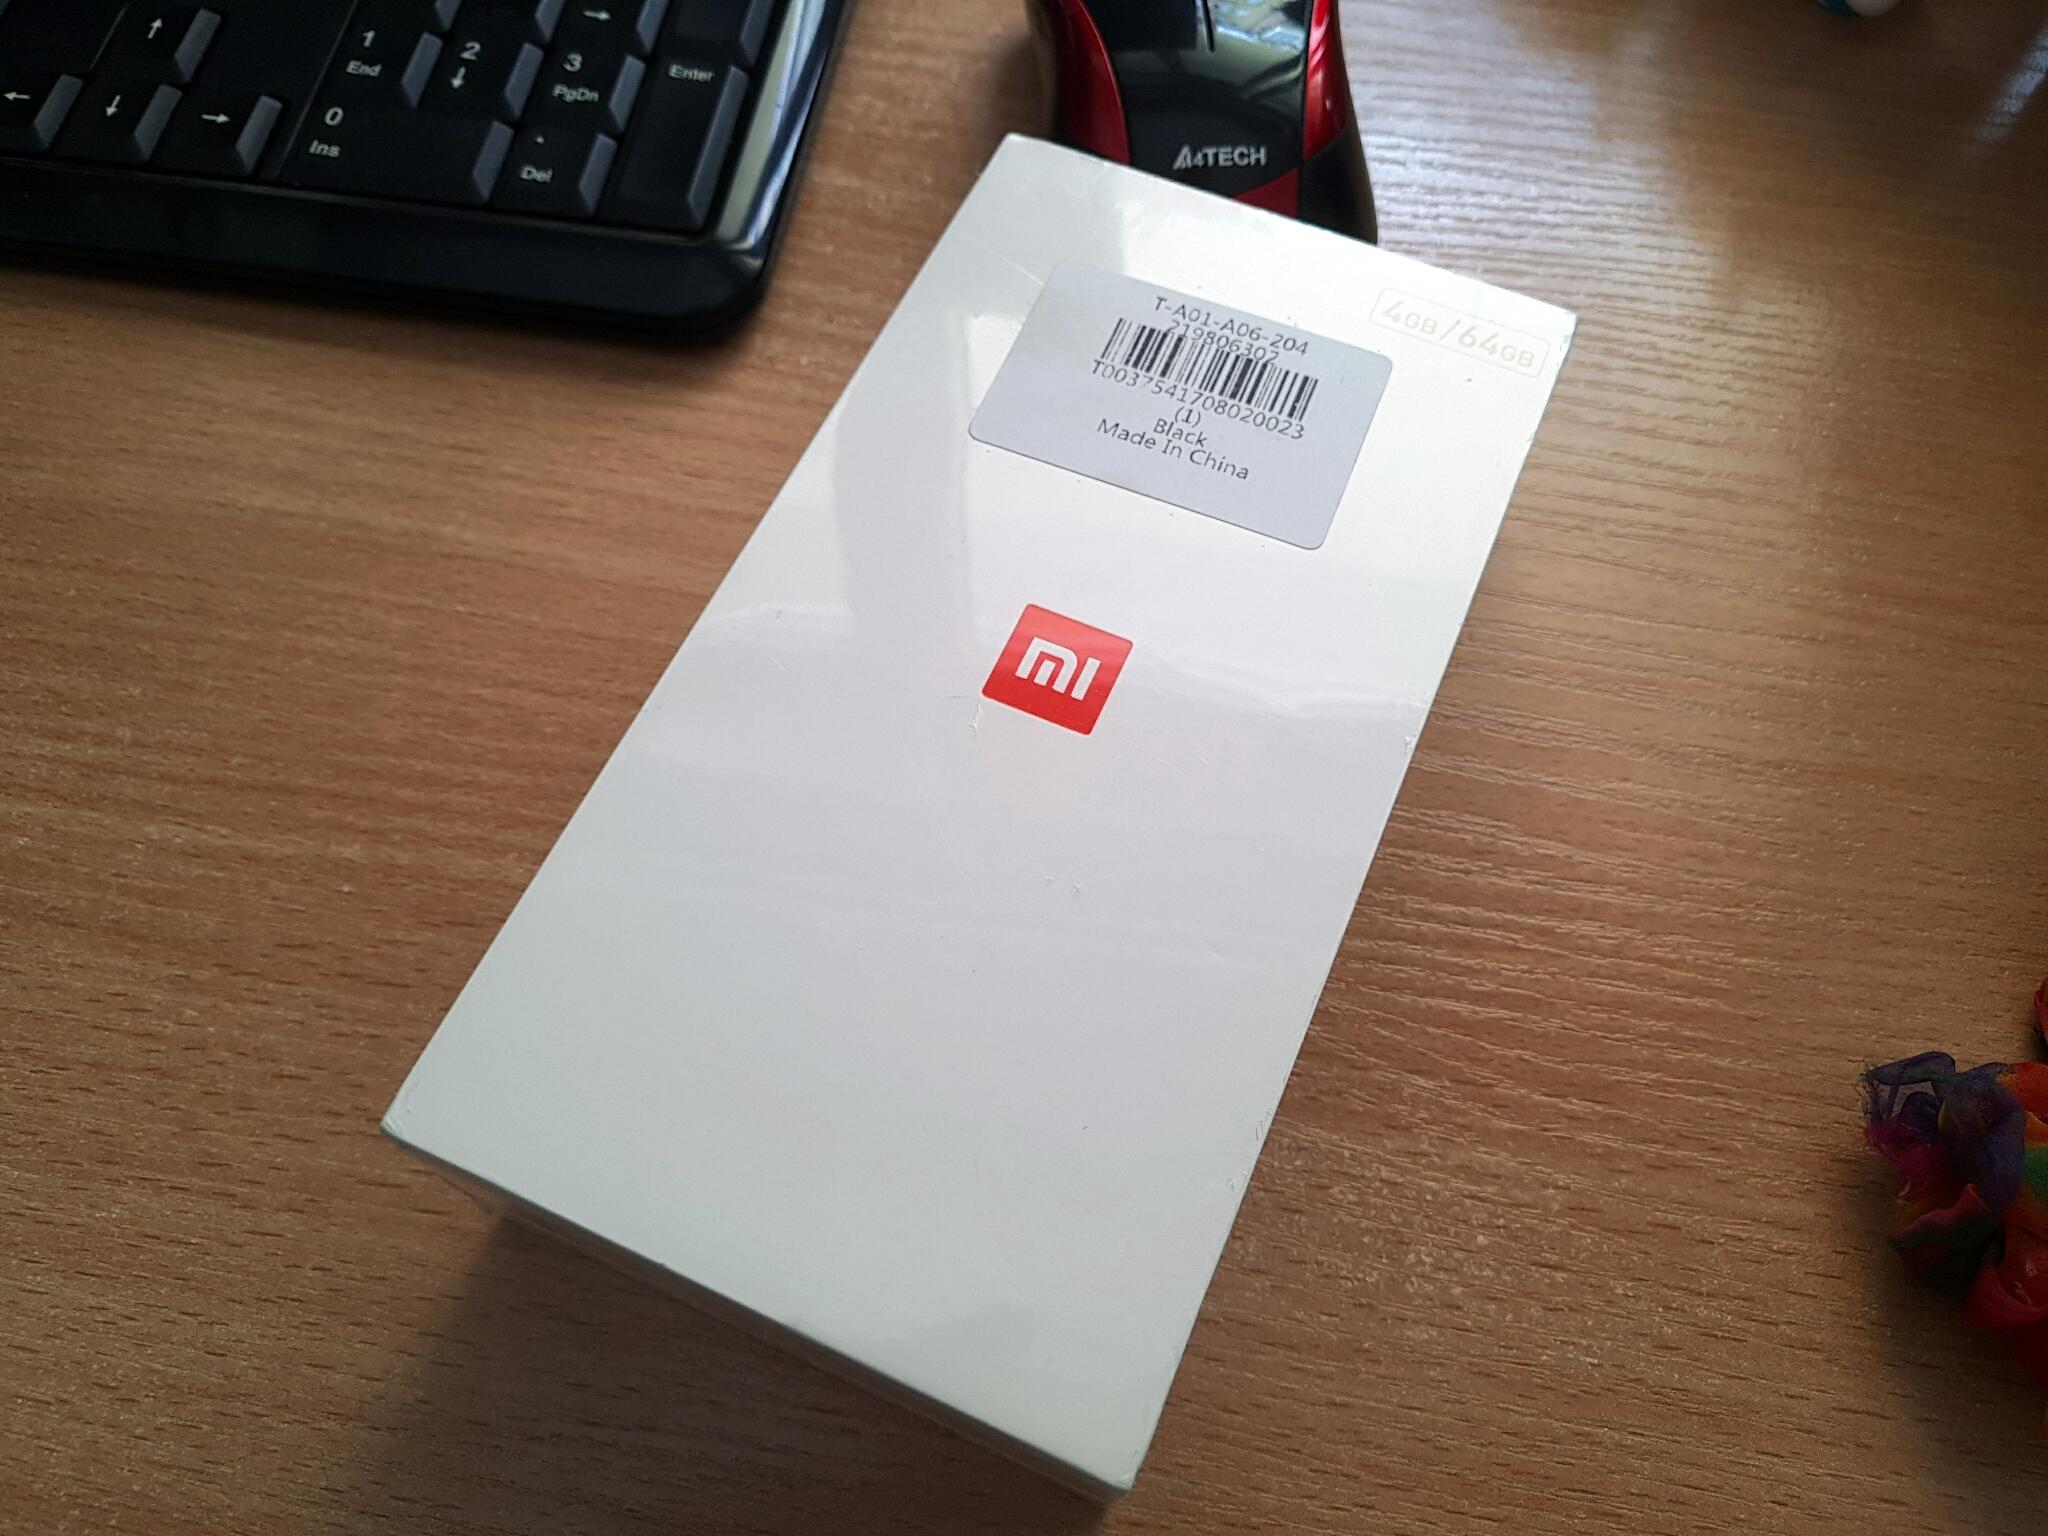 Xiaomi Mi 5x Unboxing First Impressions – Xiaomi Keeps Improving · OPPO R11 R11 Plus